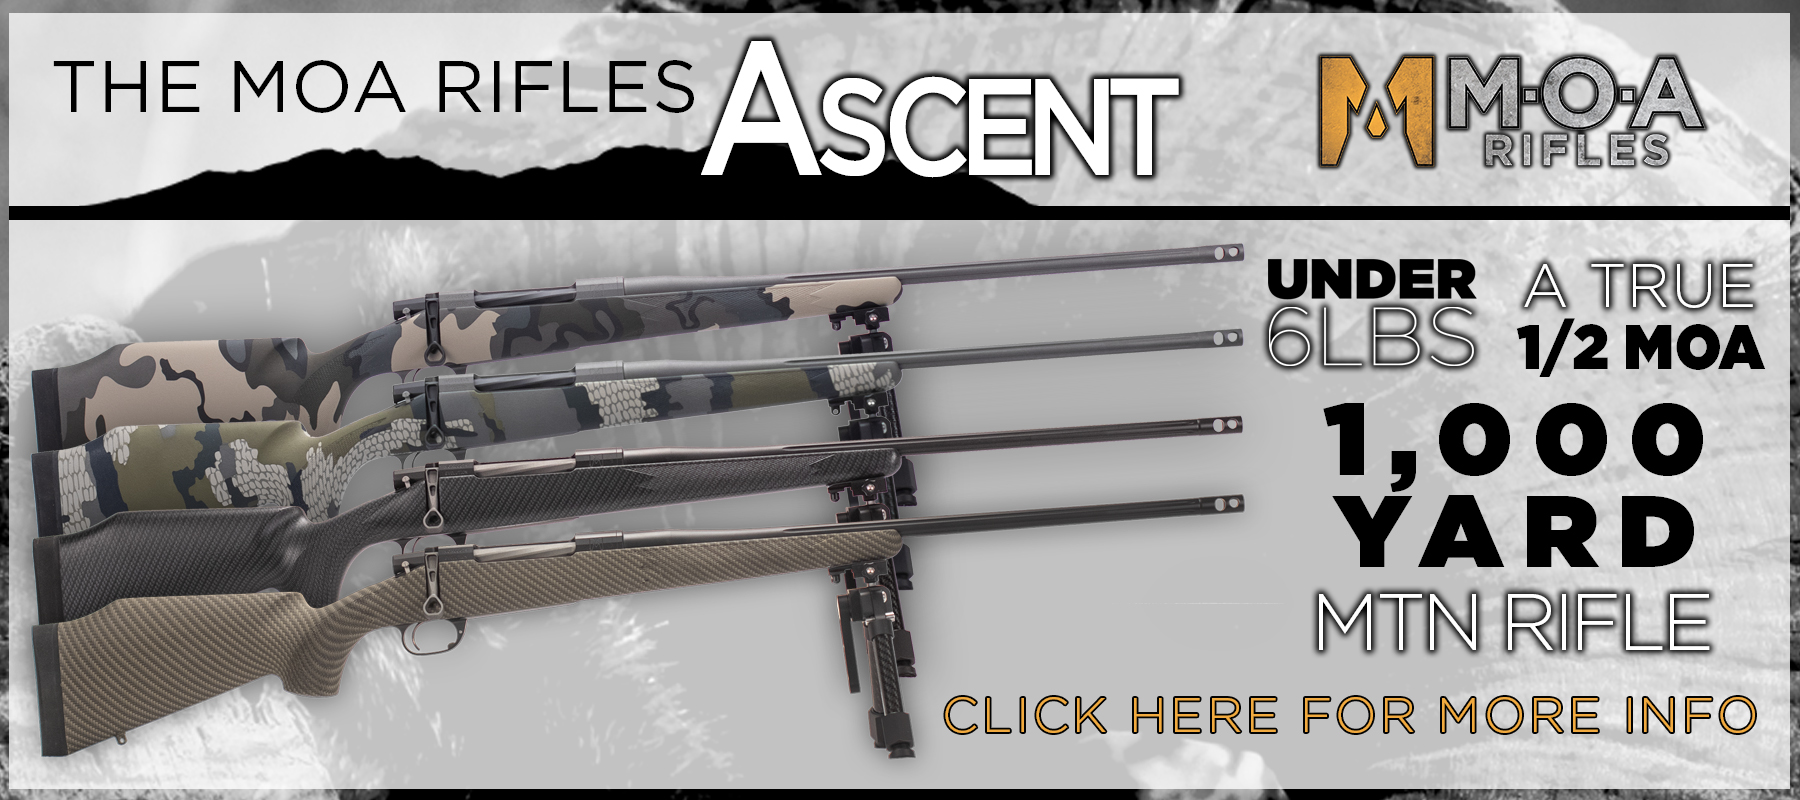 MOA Rifles | The Evolution of Long Range Hunting Rifles – THE